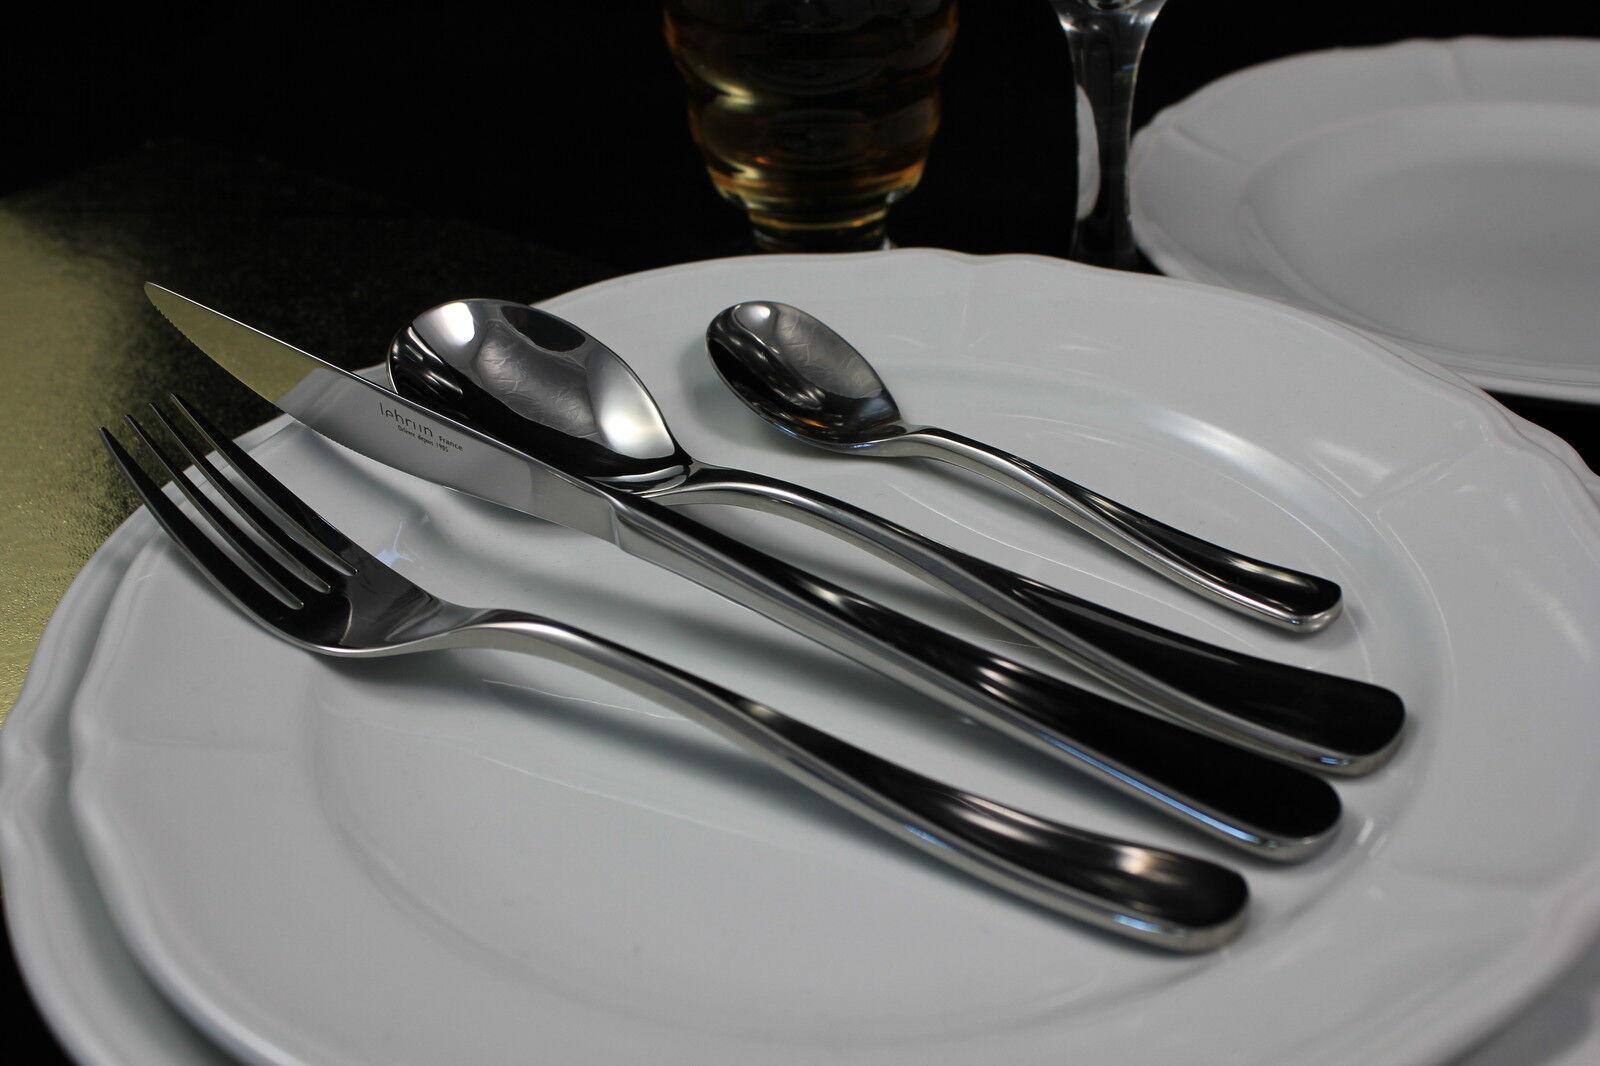 Set POSATE  Ipanema  in acciaio inox 18 10, 24 pezzi di Lebrun per 6 persone